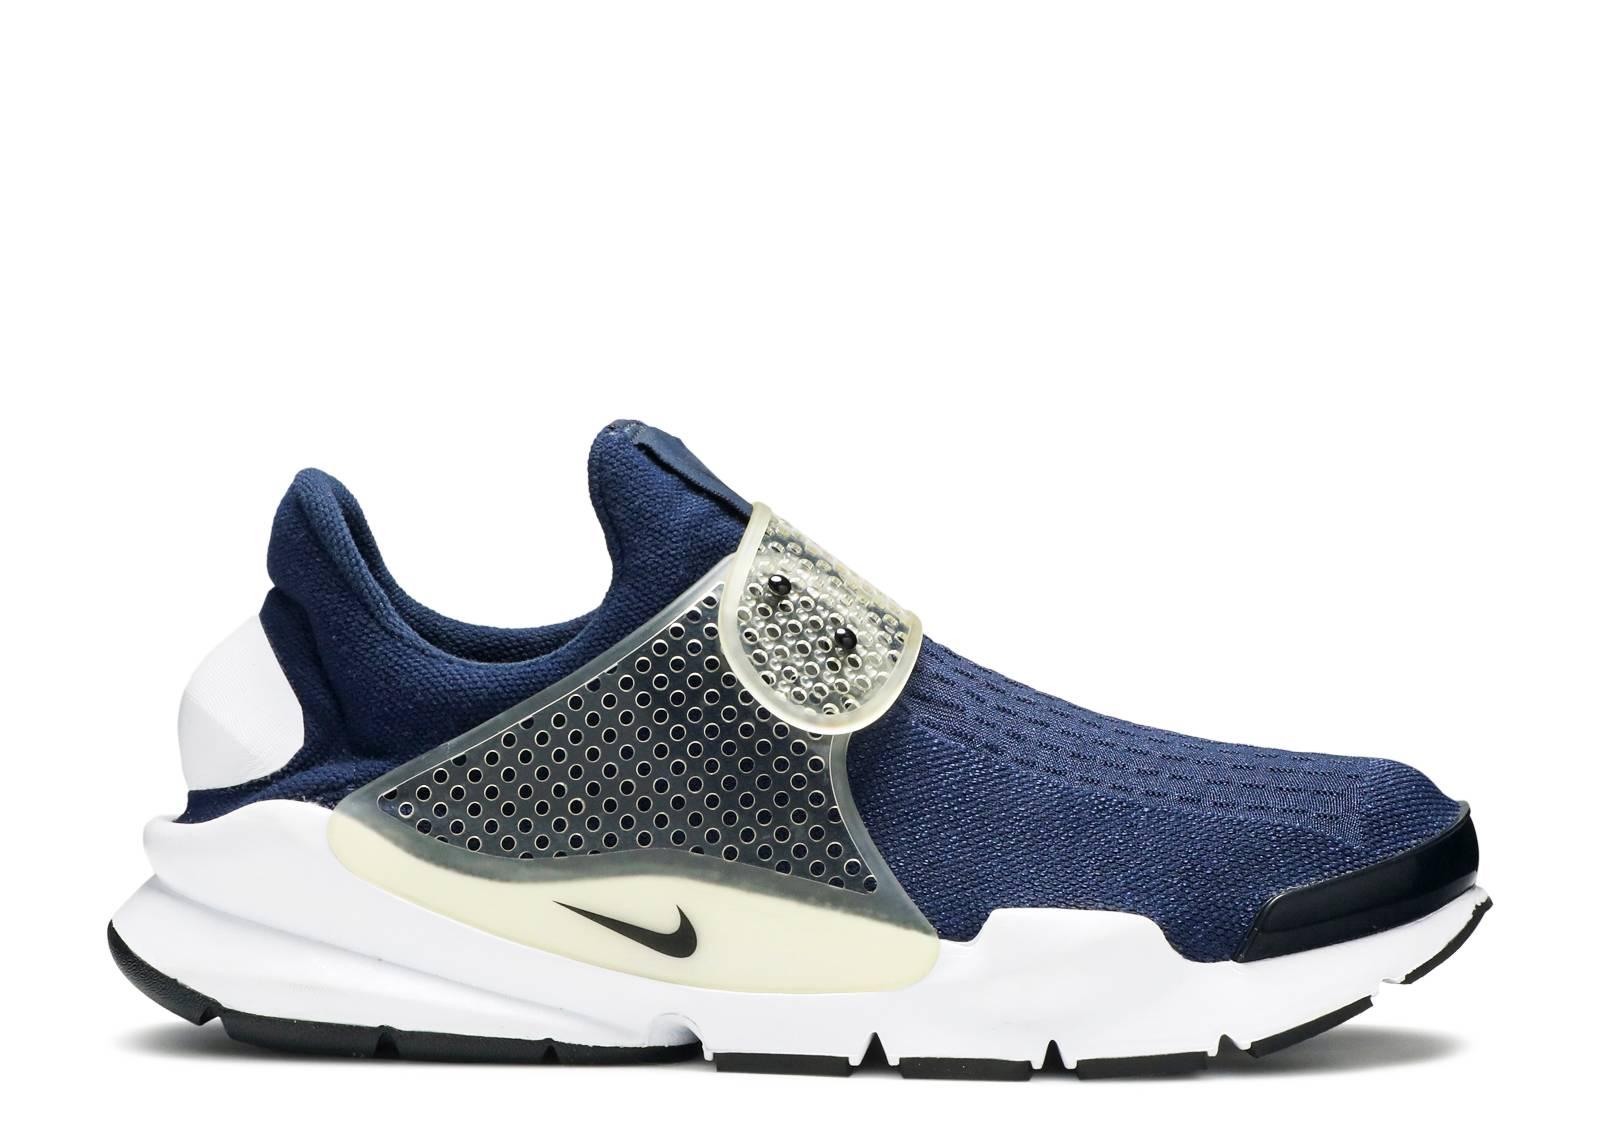 b0b407425bf Sock Dart - Nike - 819686 400 - mid navy blk-mdm gry-white